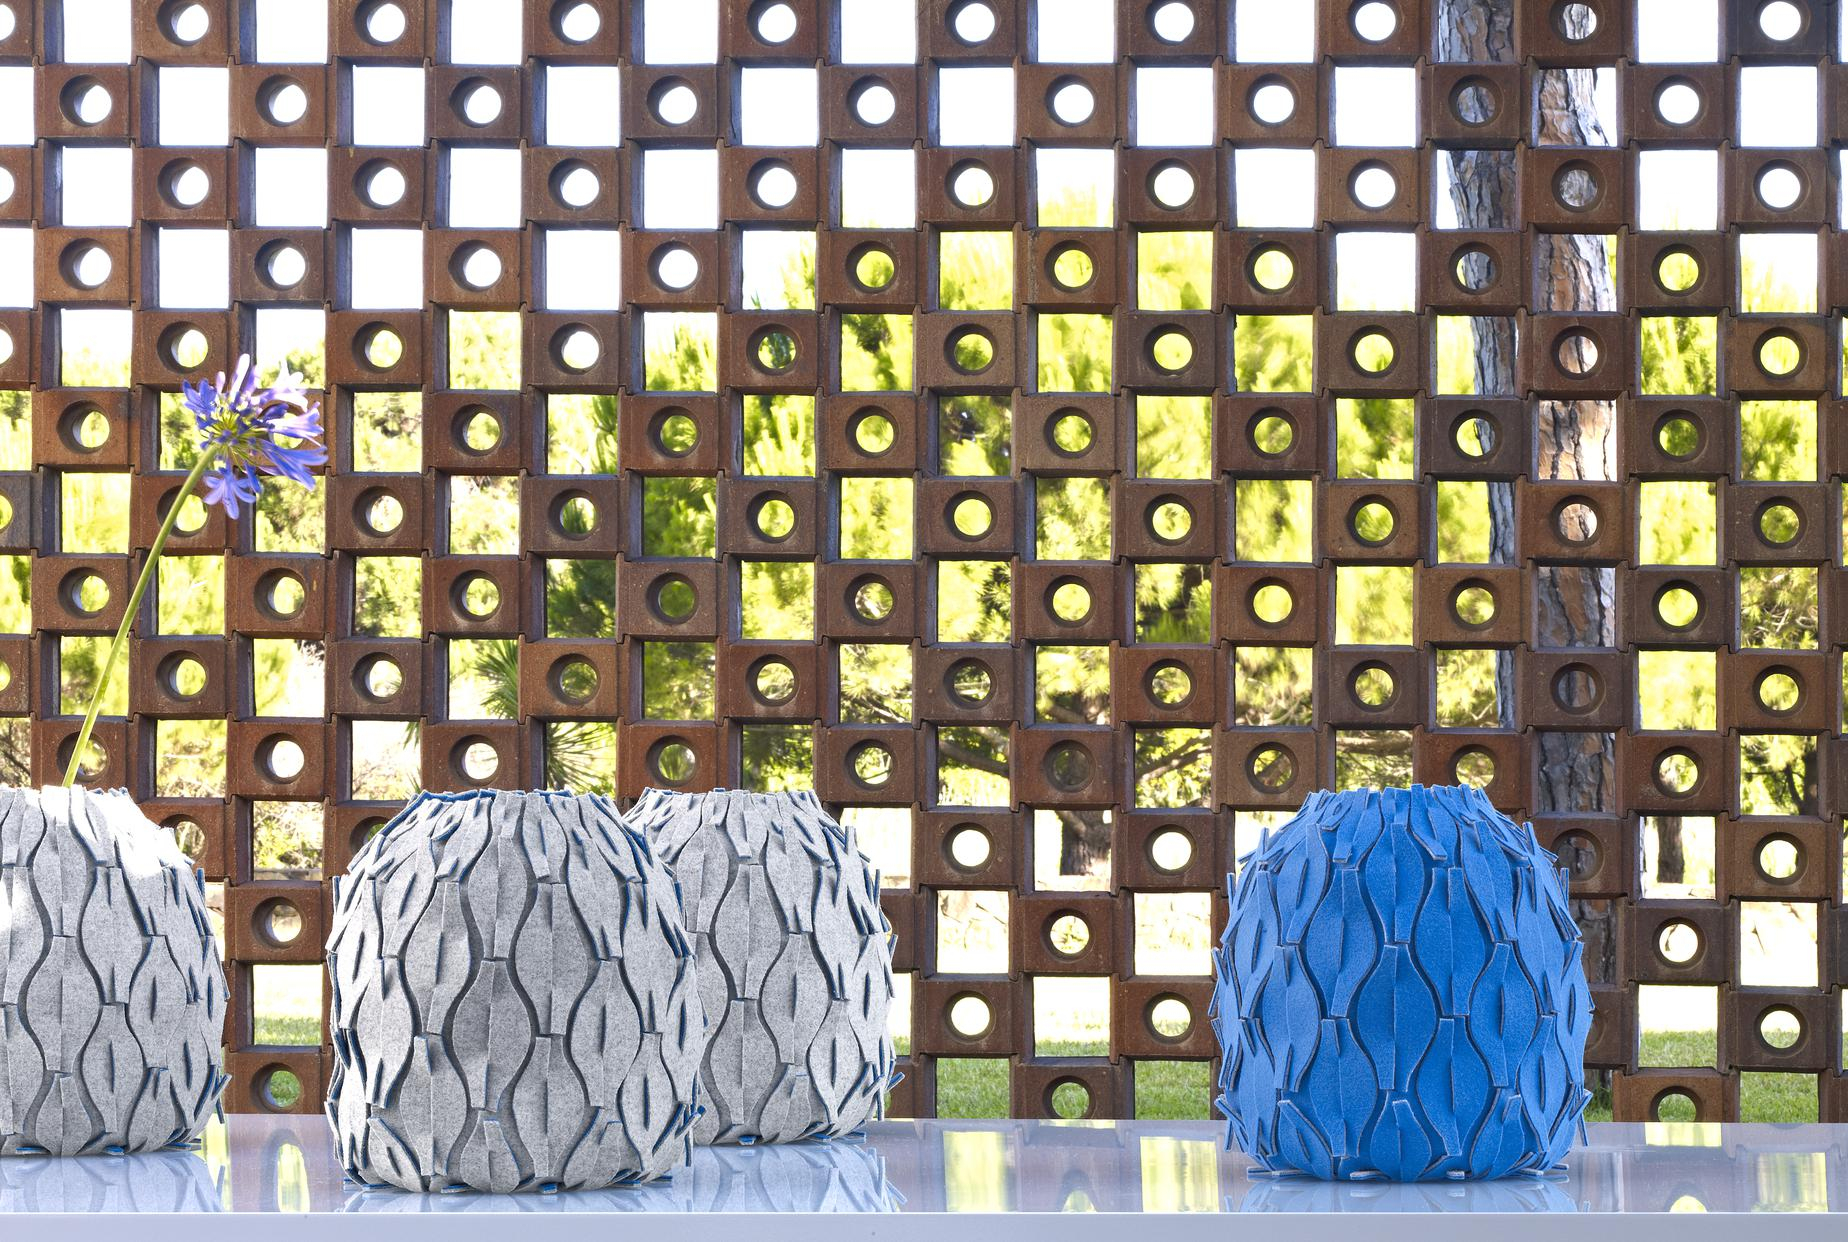 Vase: Asira, Vases & Bowls From Designer : Aurelie Tu dedans Tangram En Ligne